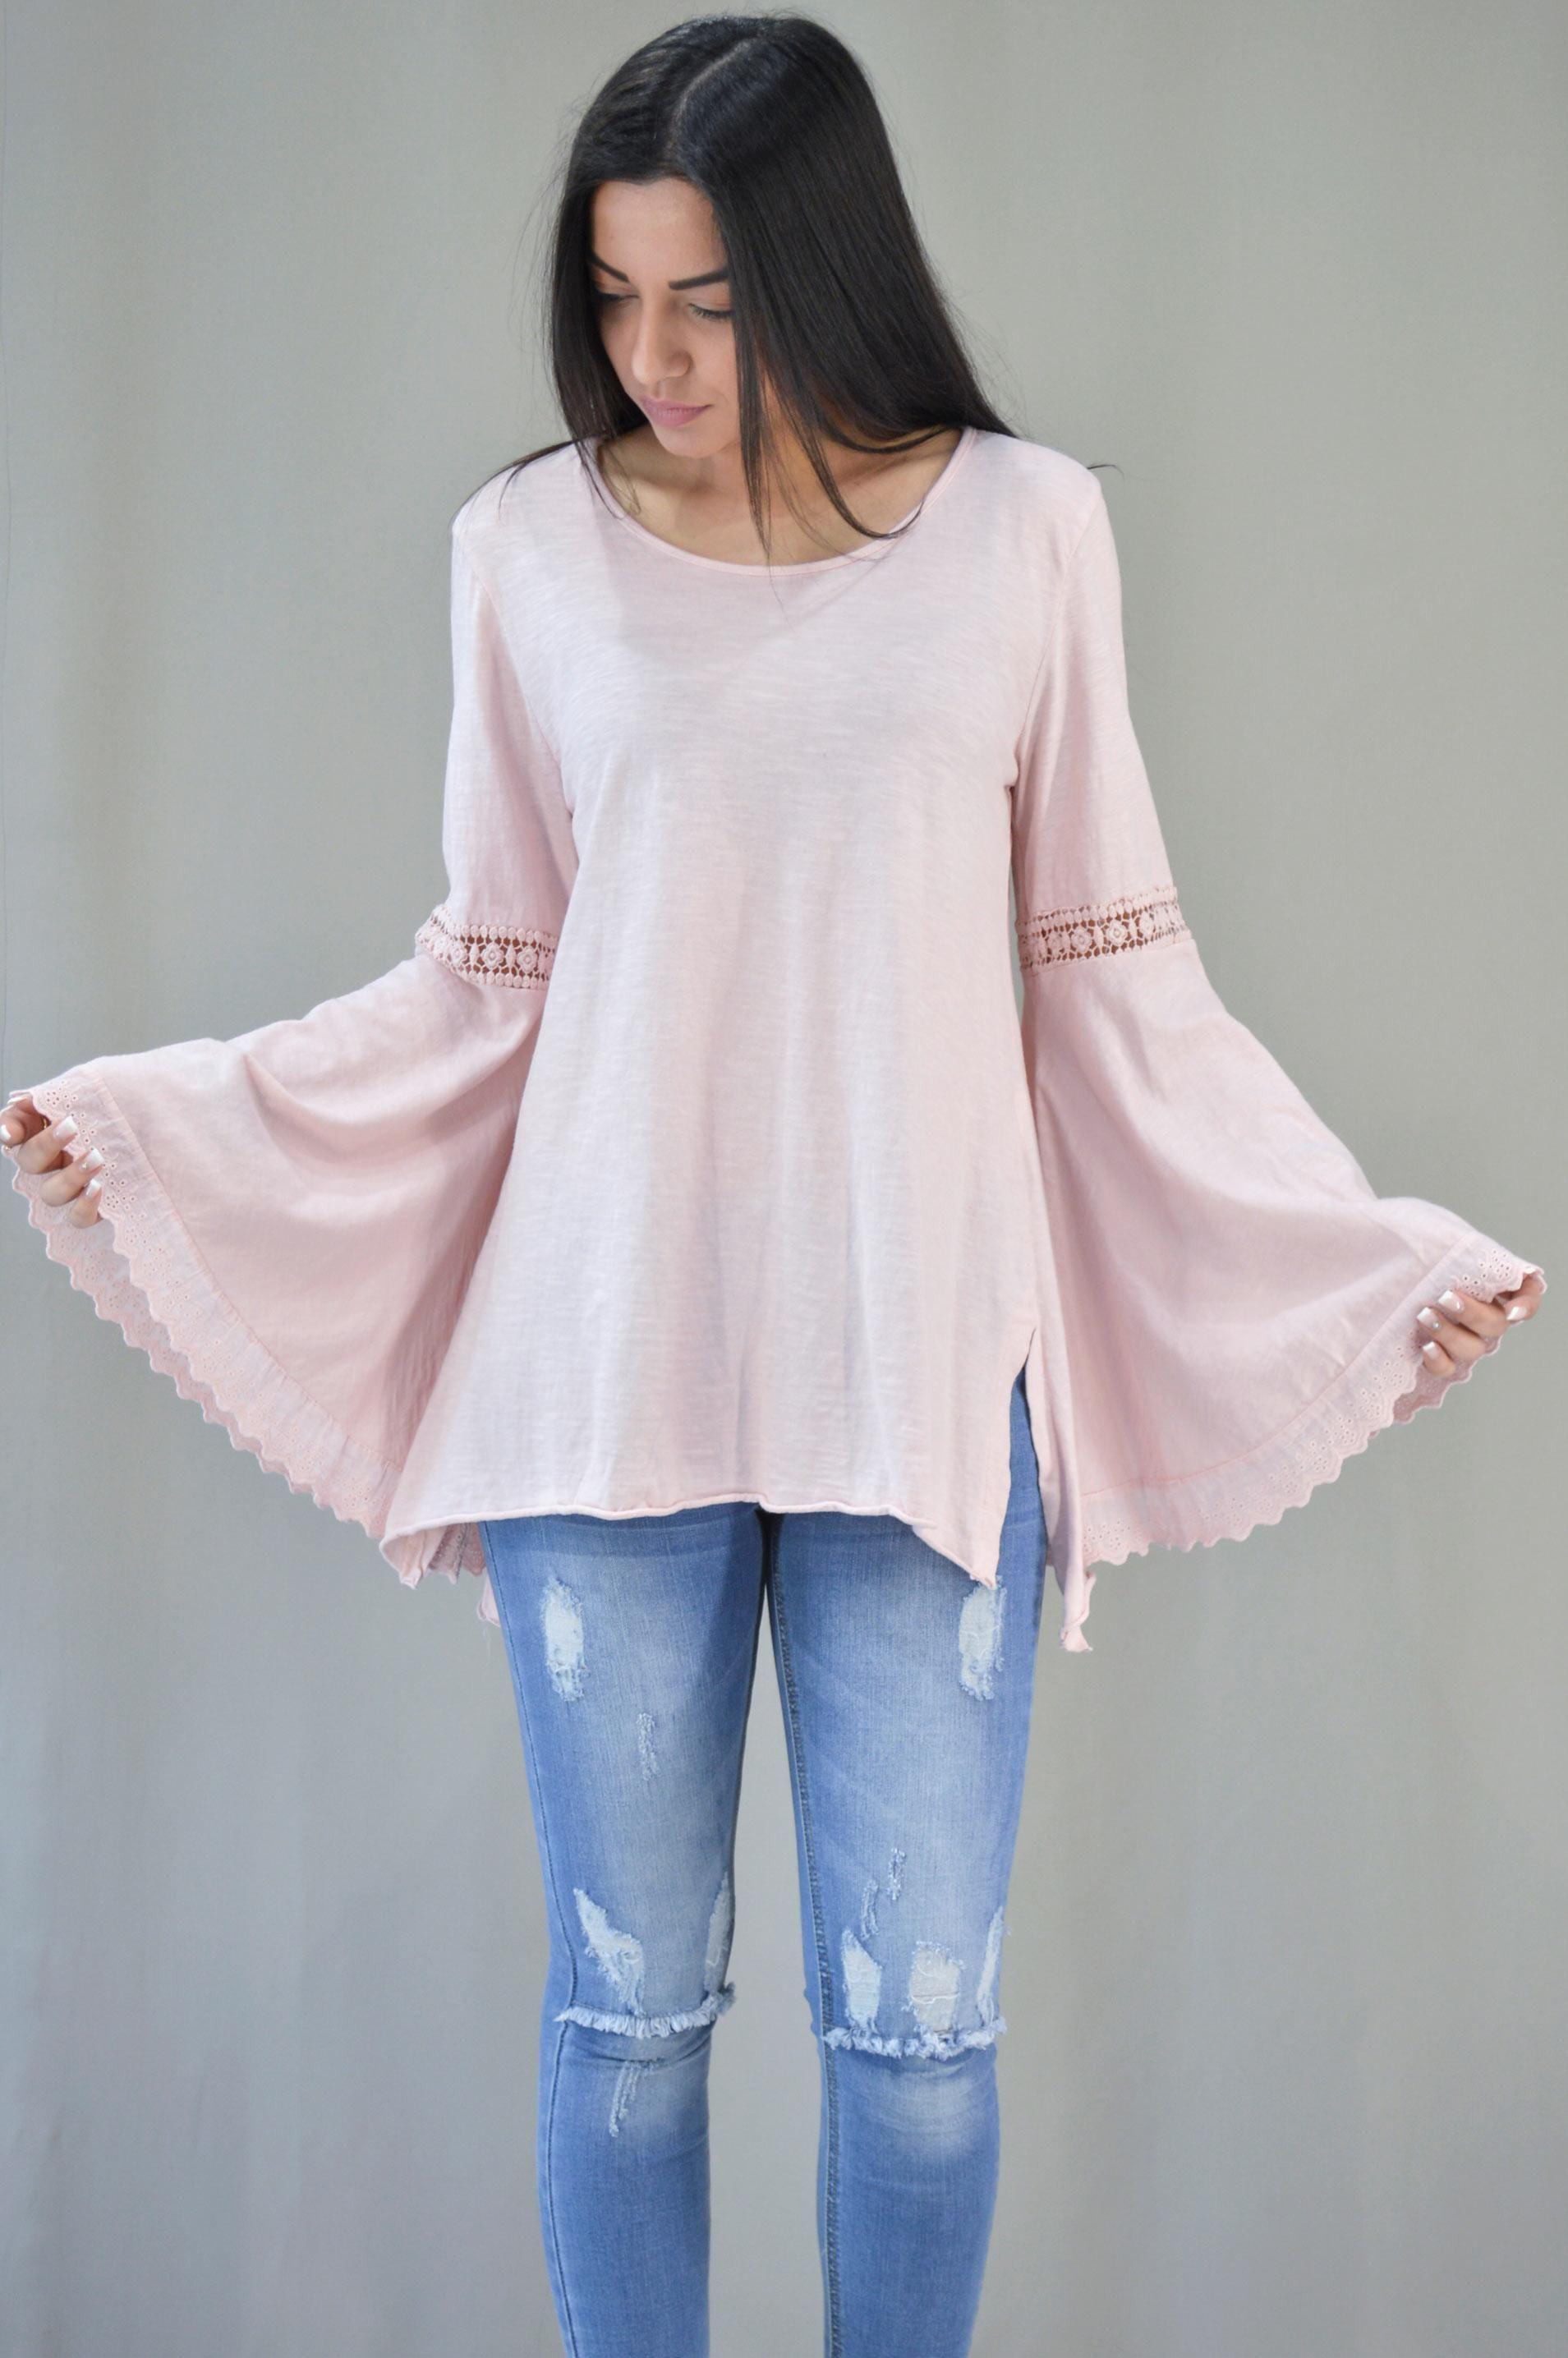 3cec5ba16ac2 Γυναικεία μπλούζα με καμπάνα μανίκι